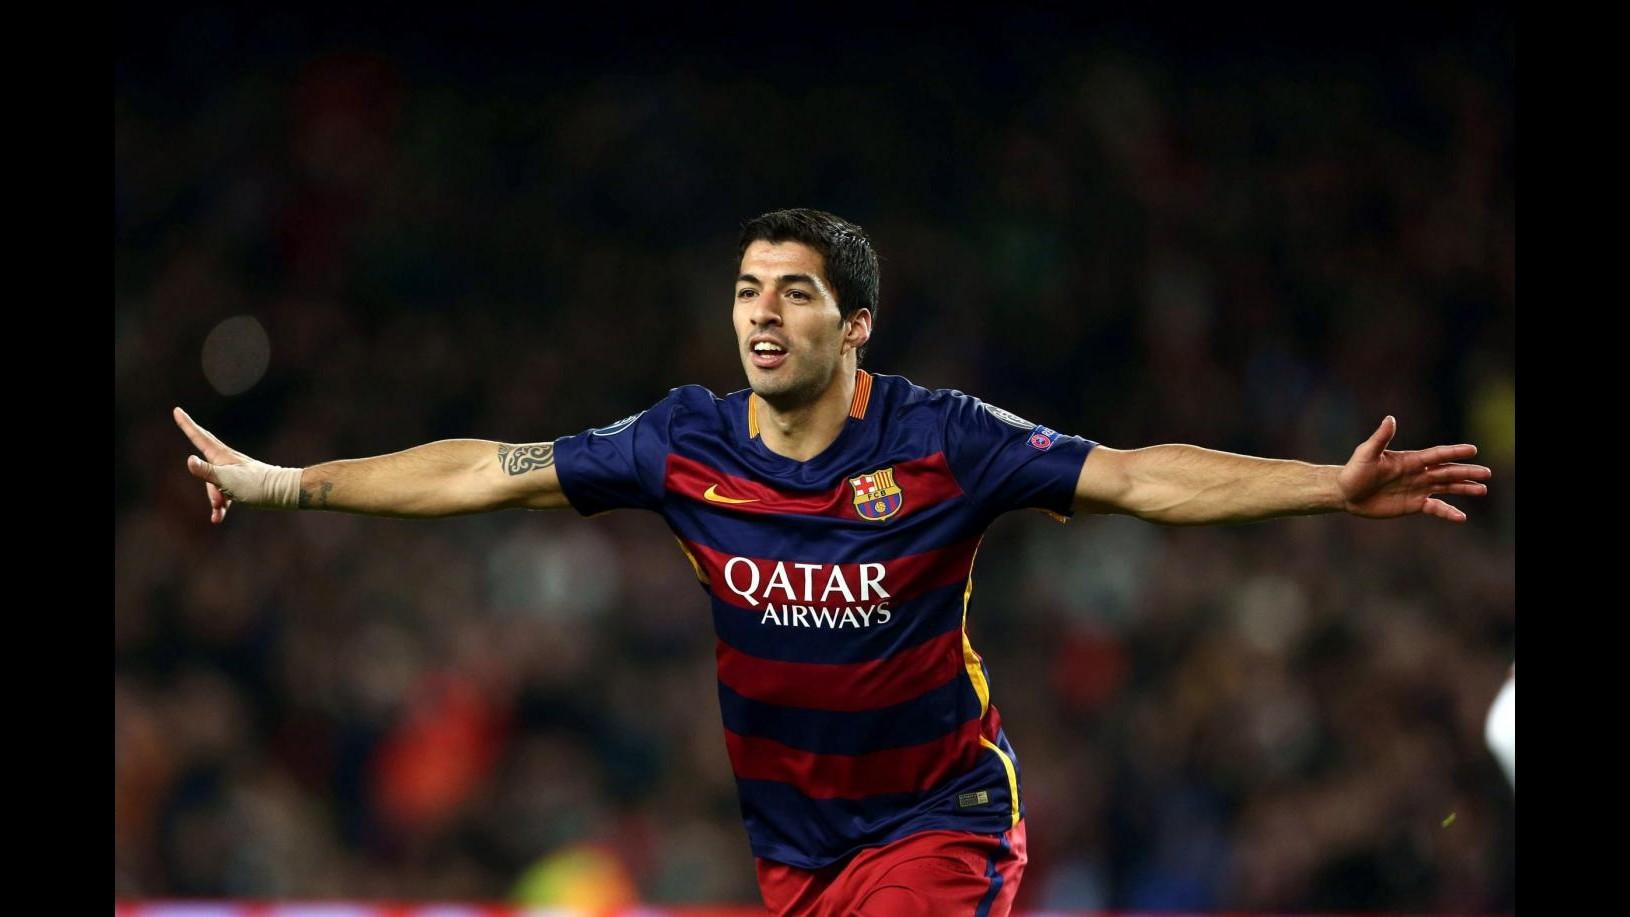 Mondiale club: Barcellona in finale, 3-0 al Guangzhou